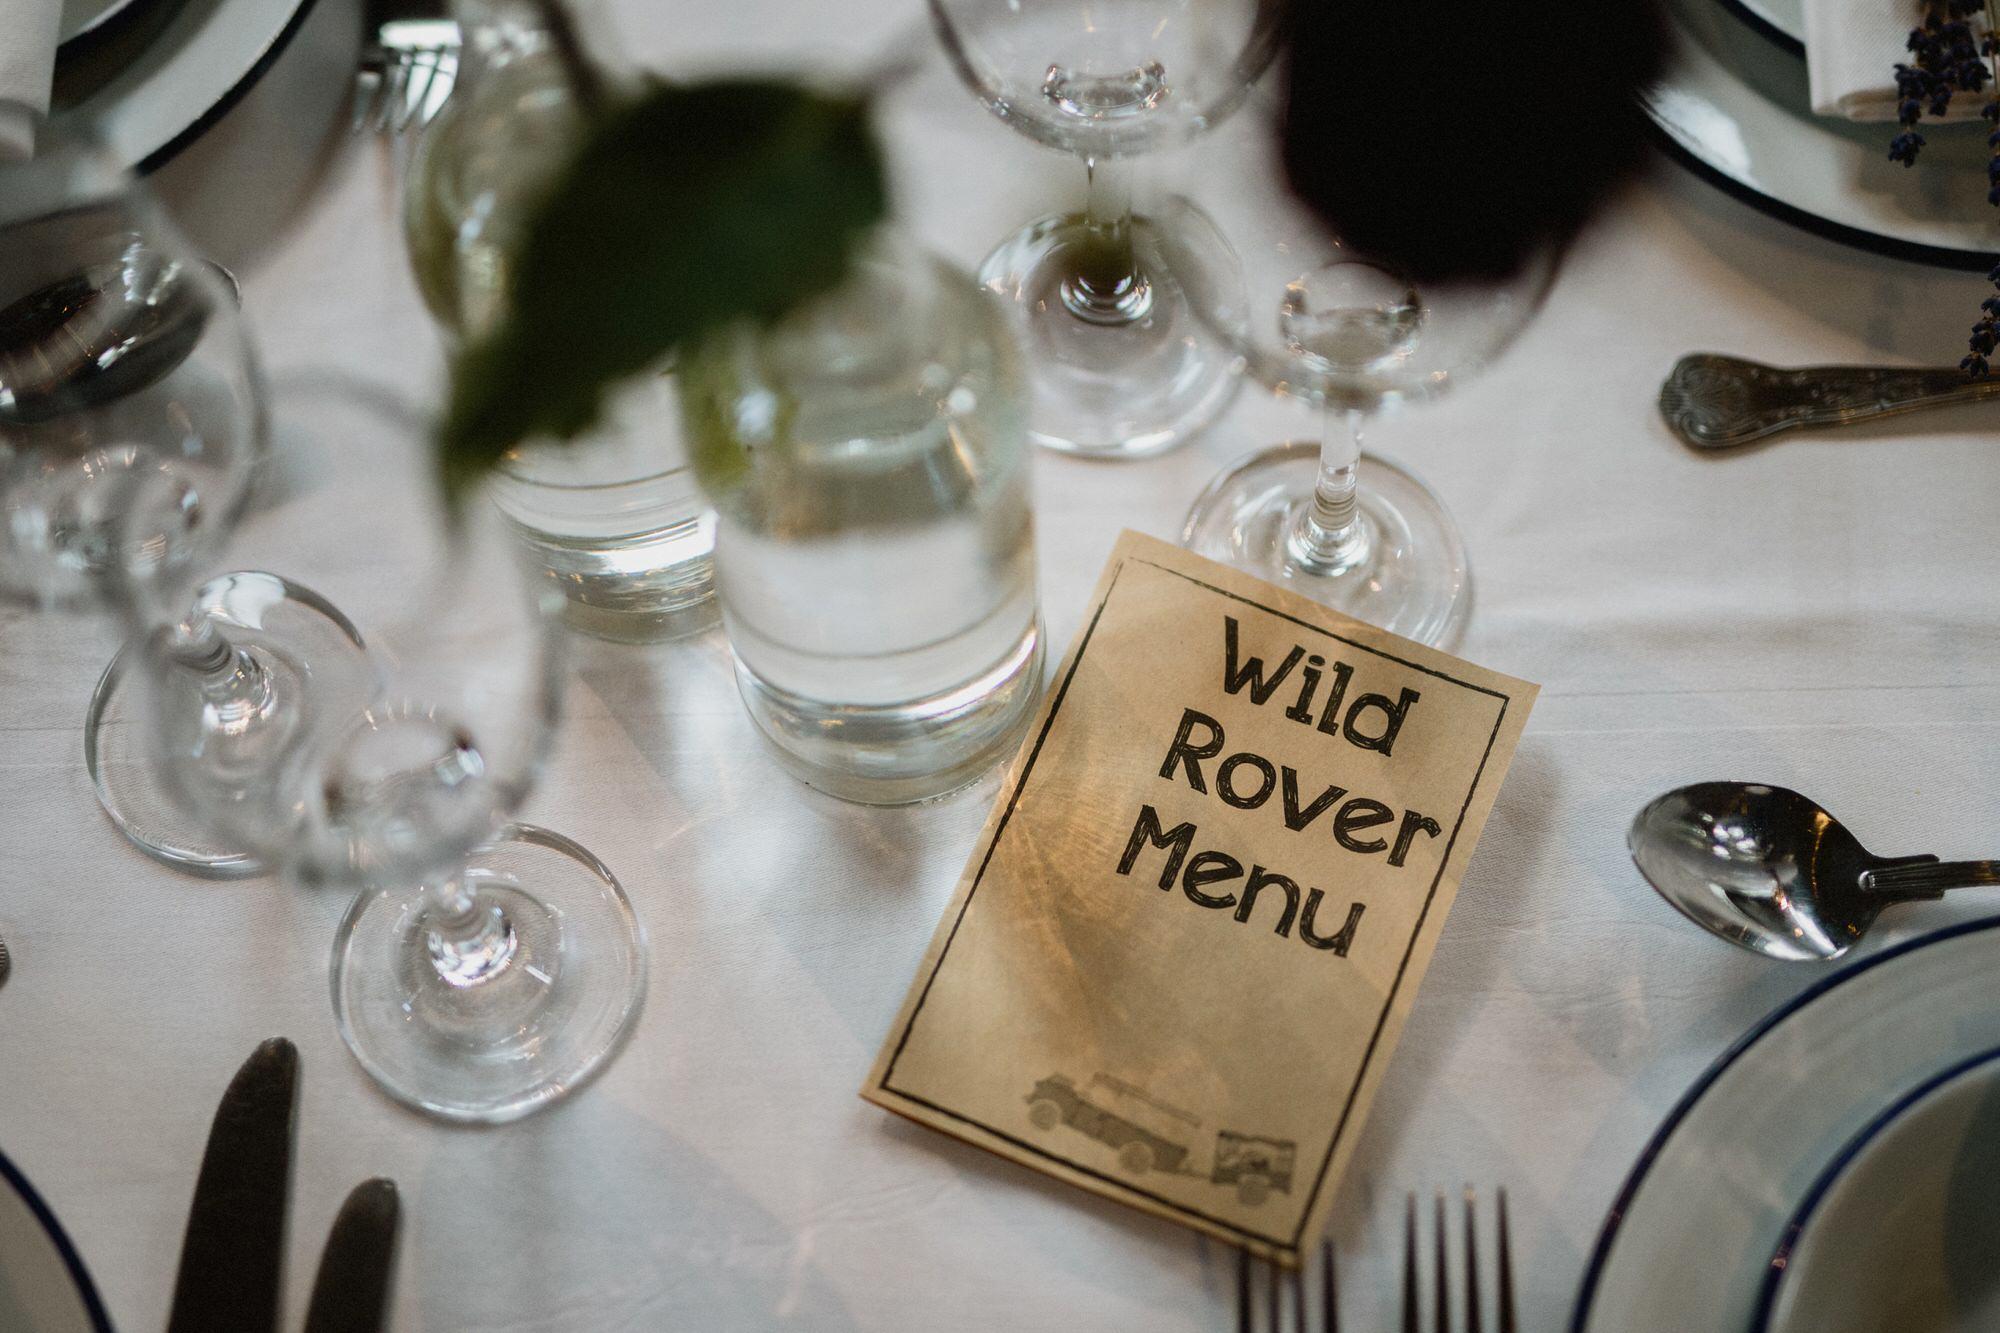 037 WILD ROVER CATERING FOOD TIN SHED KNOCKRAICH WEDDING AUTUMN ZOE ALEXANDRA PHOTOGRAPHY